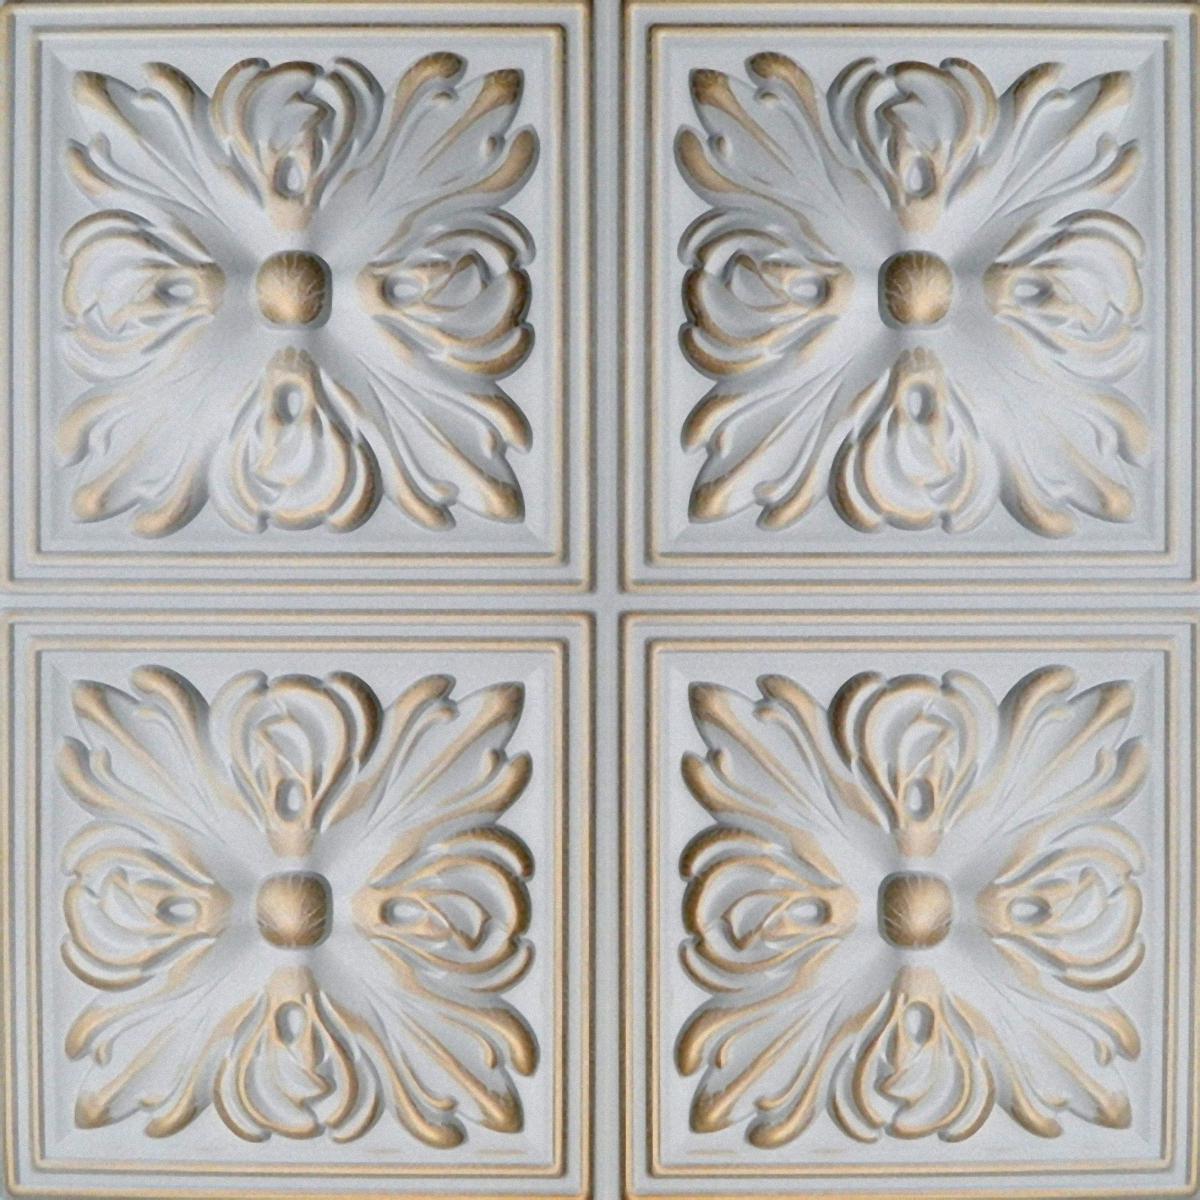 Topceilingtiles on twitter new hand painted polystyrene foam hand painted polystyrene foam ceiling tiles retro httptaketvqt81h httpt1azailxozc dailygadgetfo Choice Image